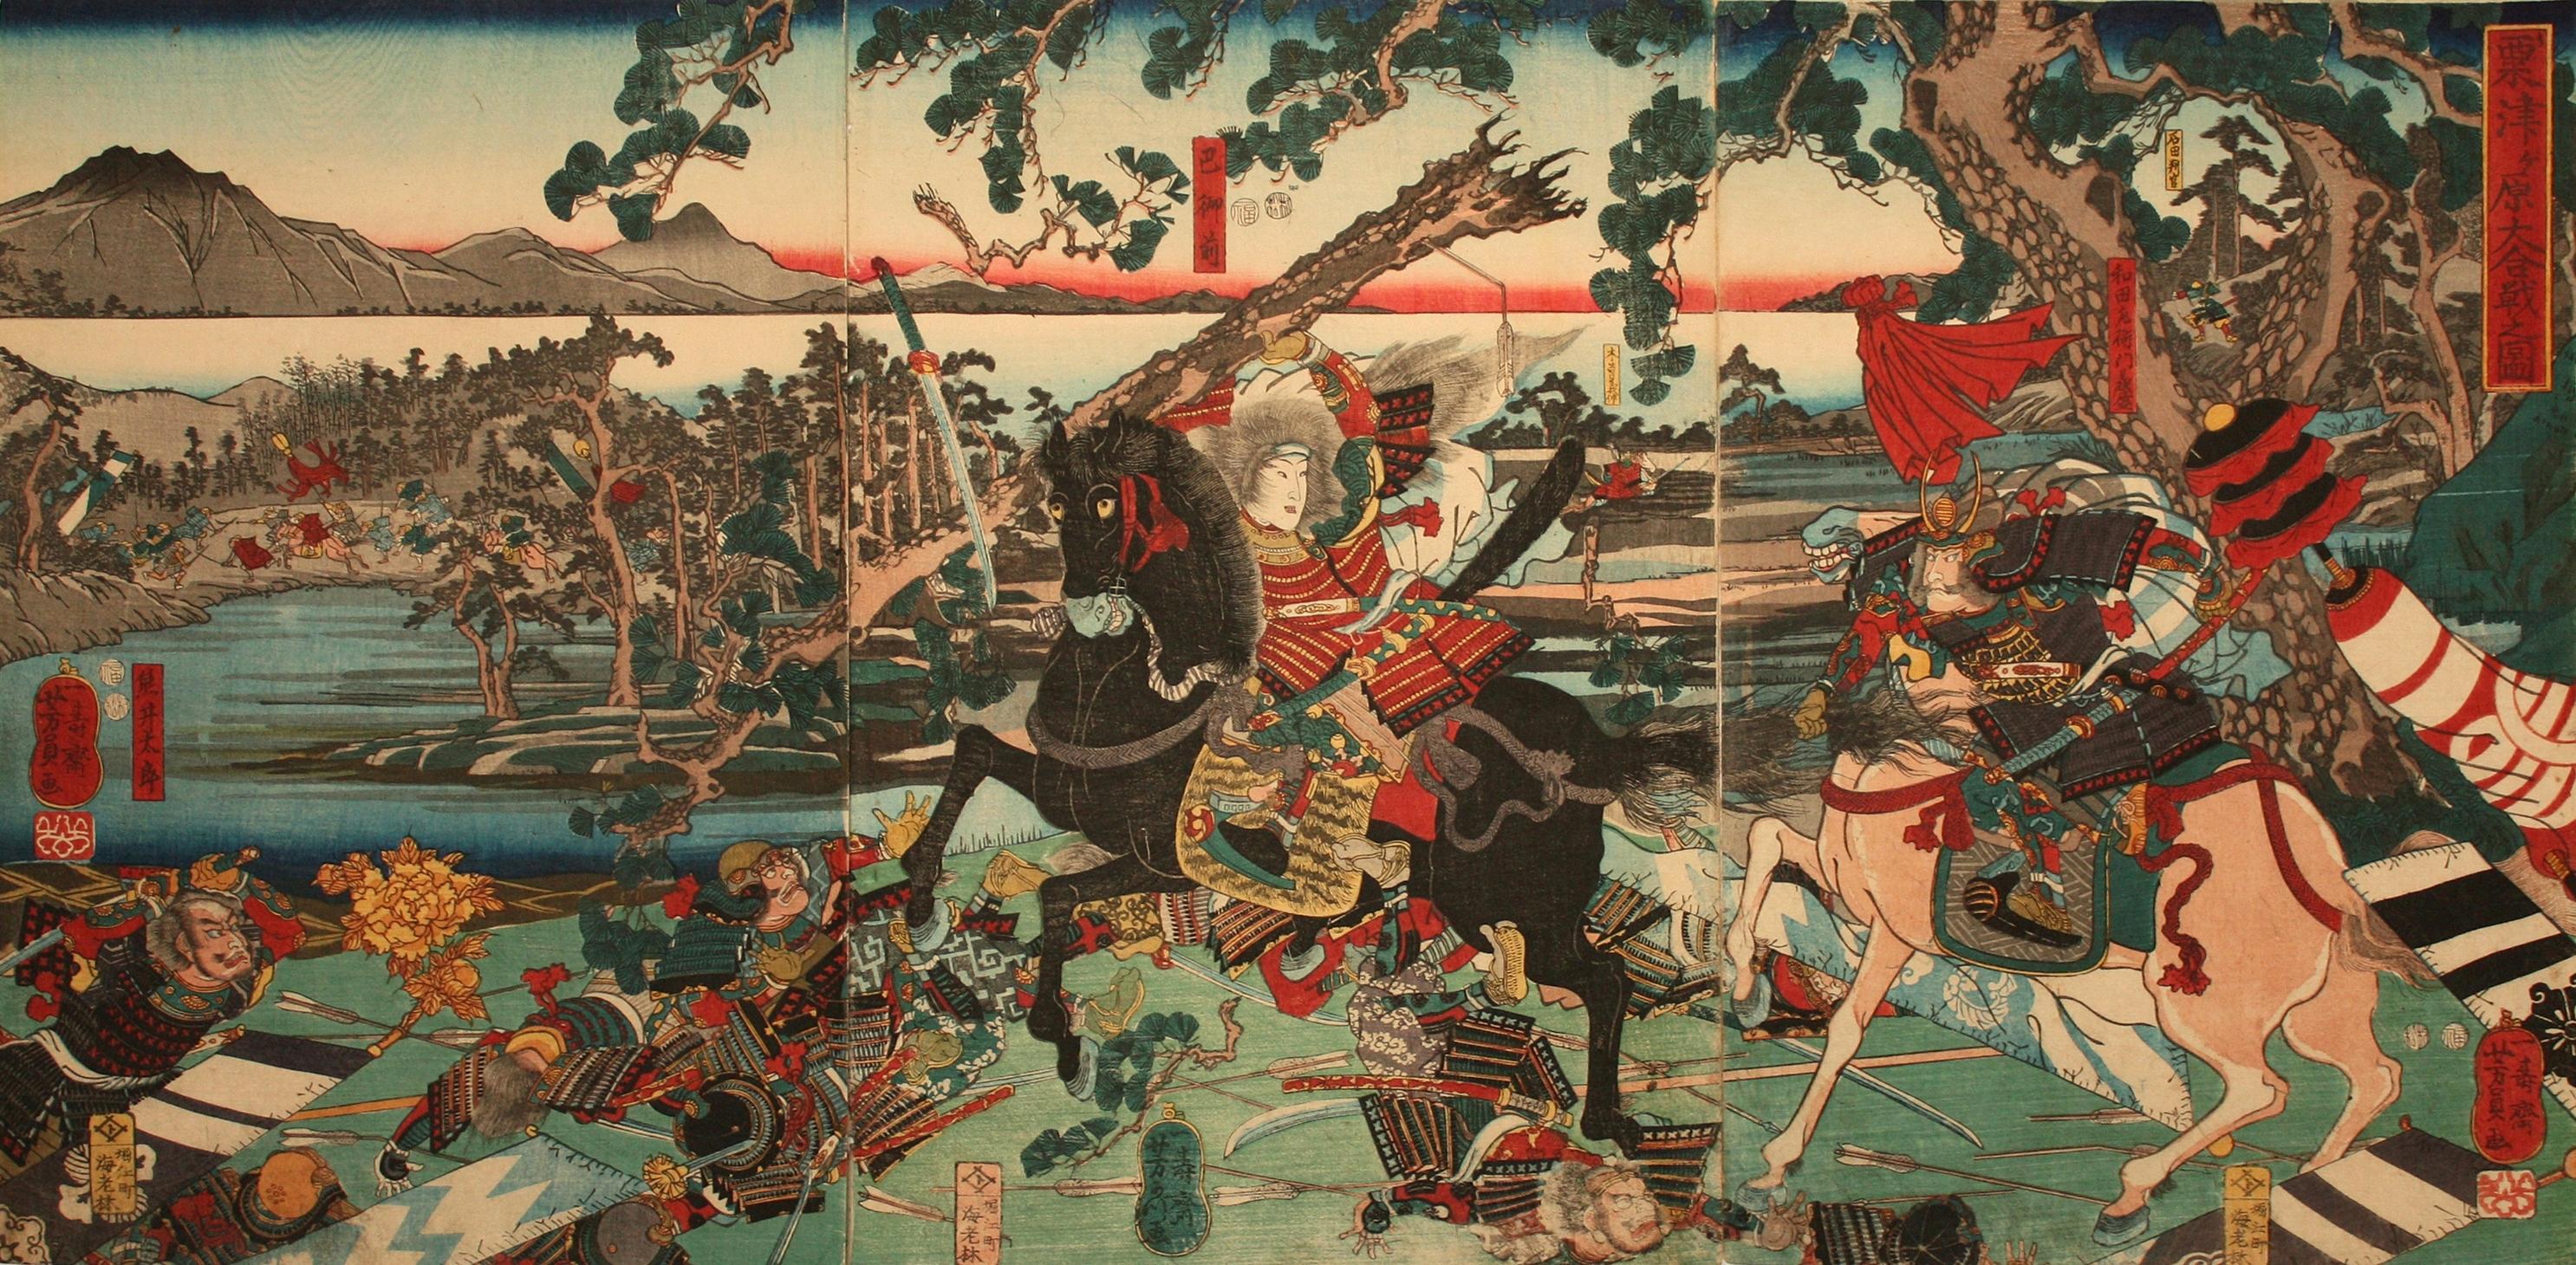 Utagawa Yoshikazu's rendition of the Battle of Awazu with Tomoe front and center.